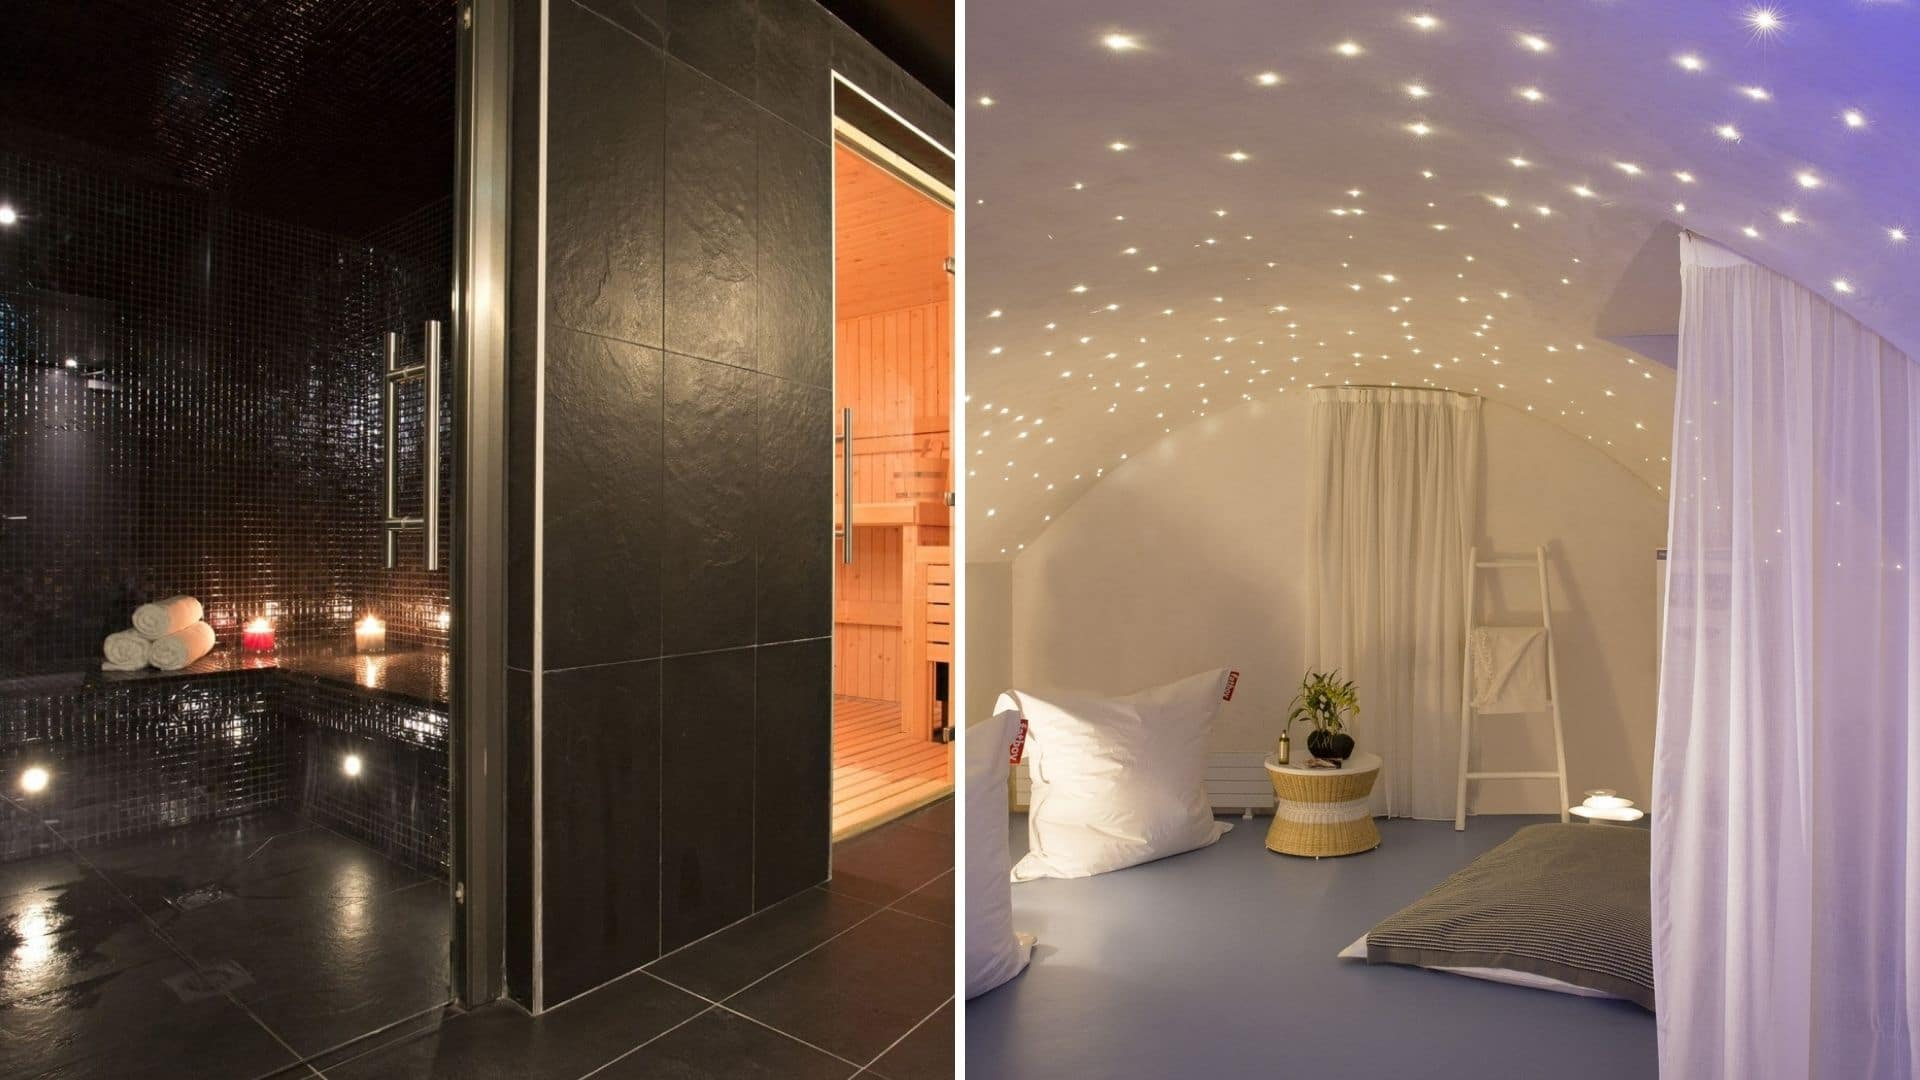 hotel mademoiselle spa paris massage hammam détente relaxation